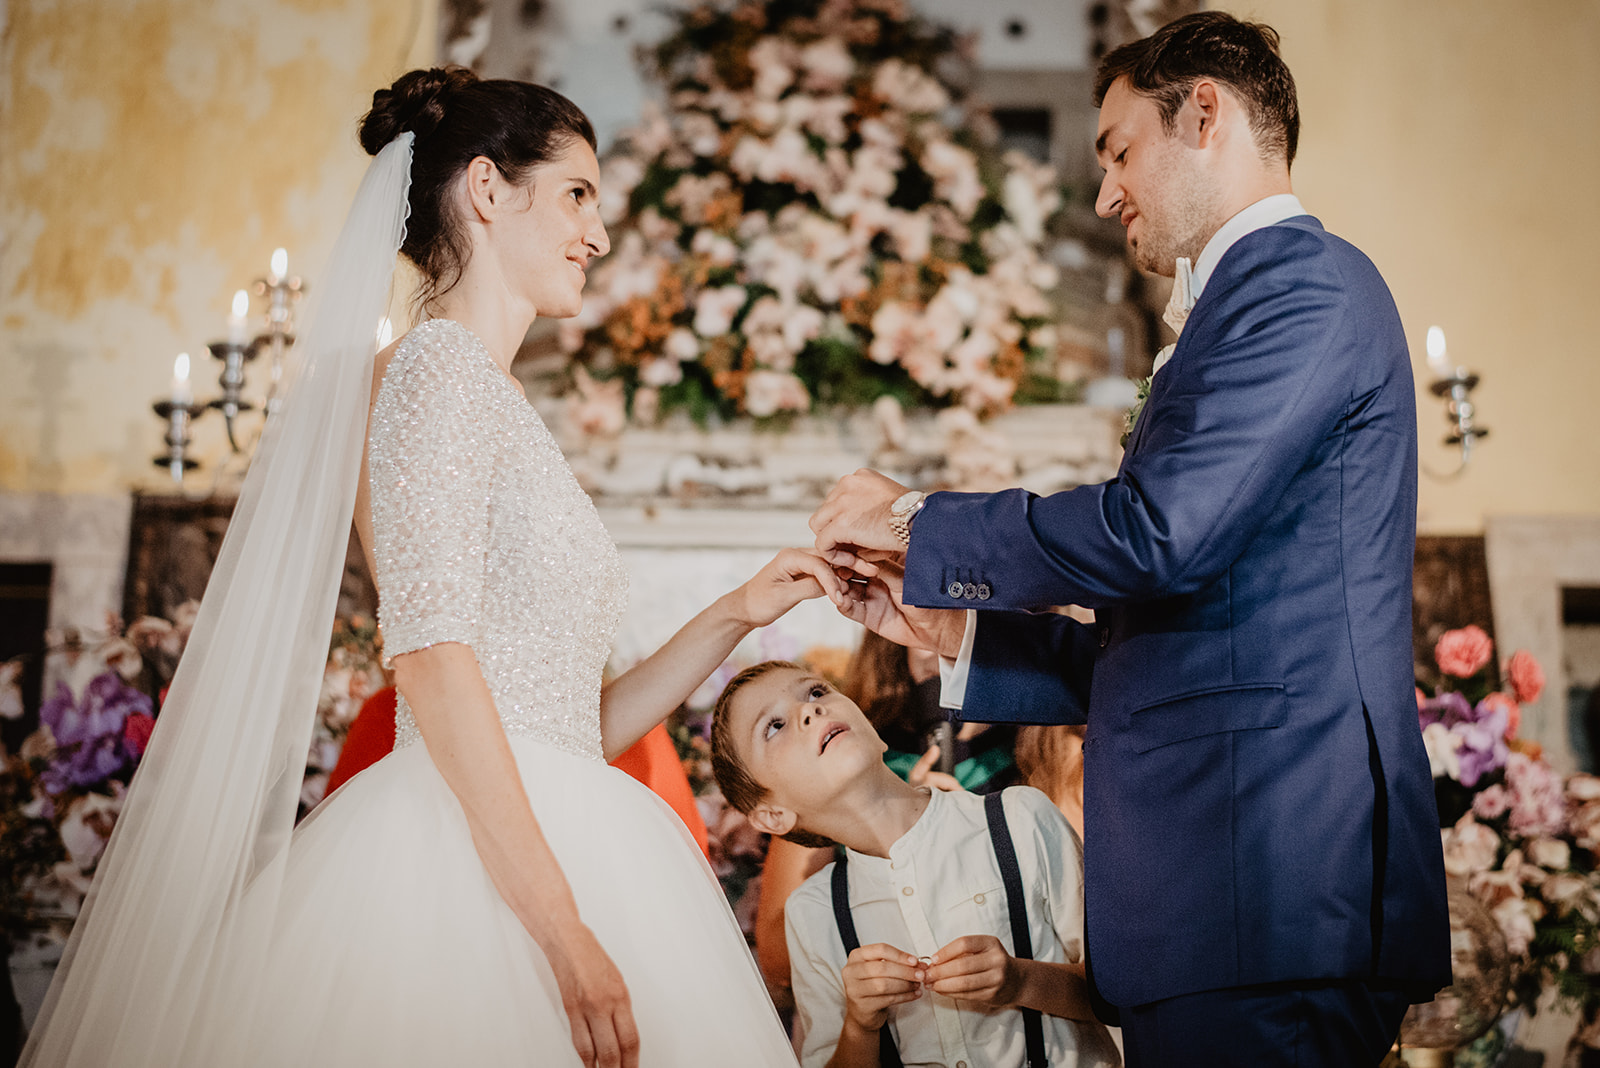 Lapela-photography-wedding-algarve-portugal-best-of-23.jpg